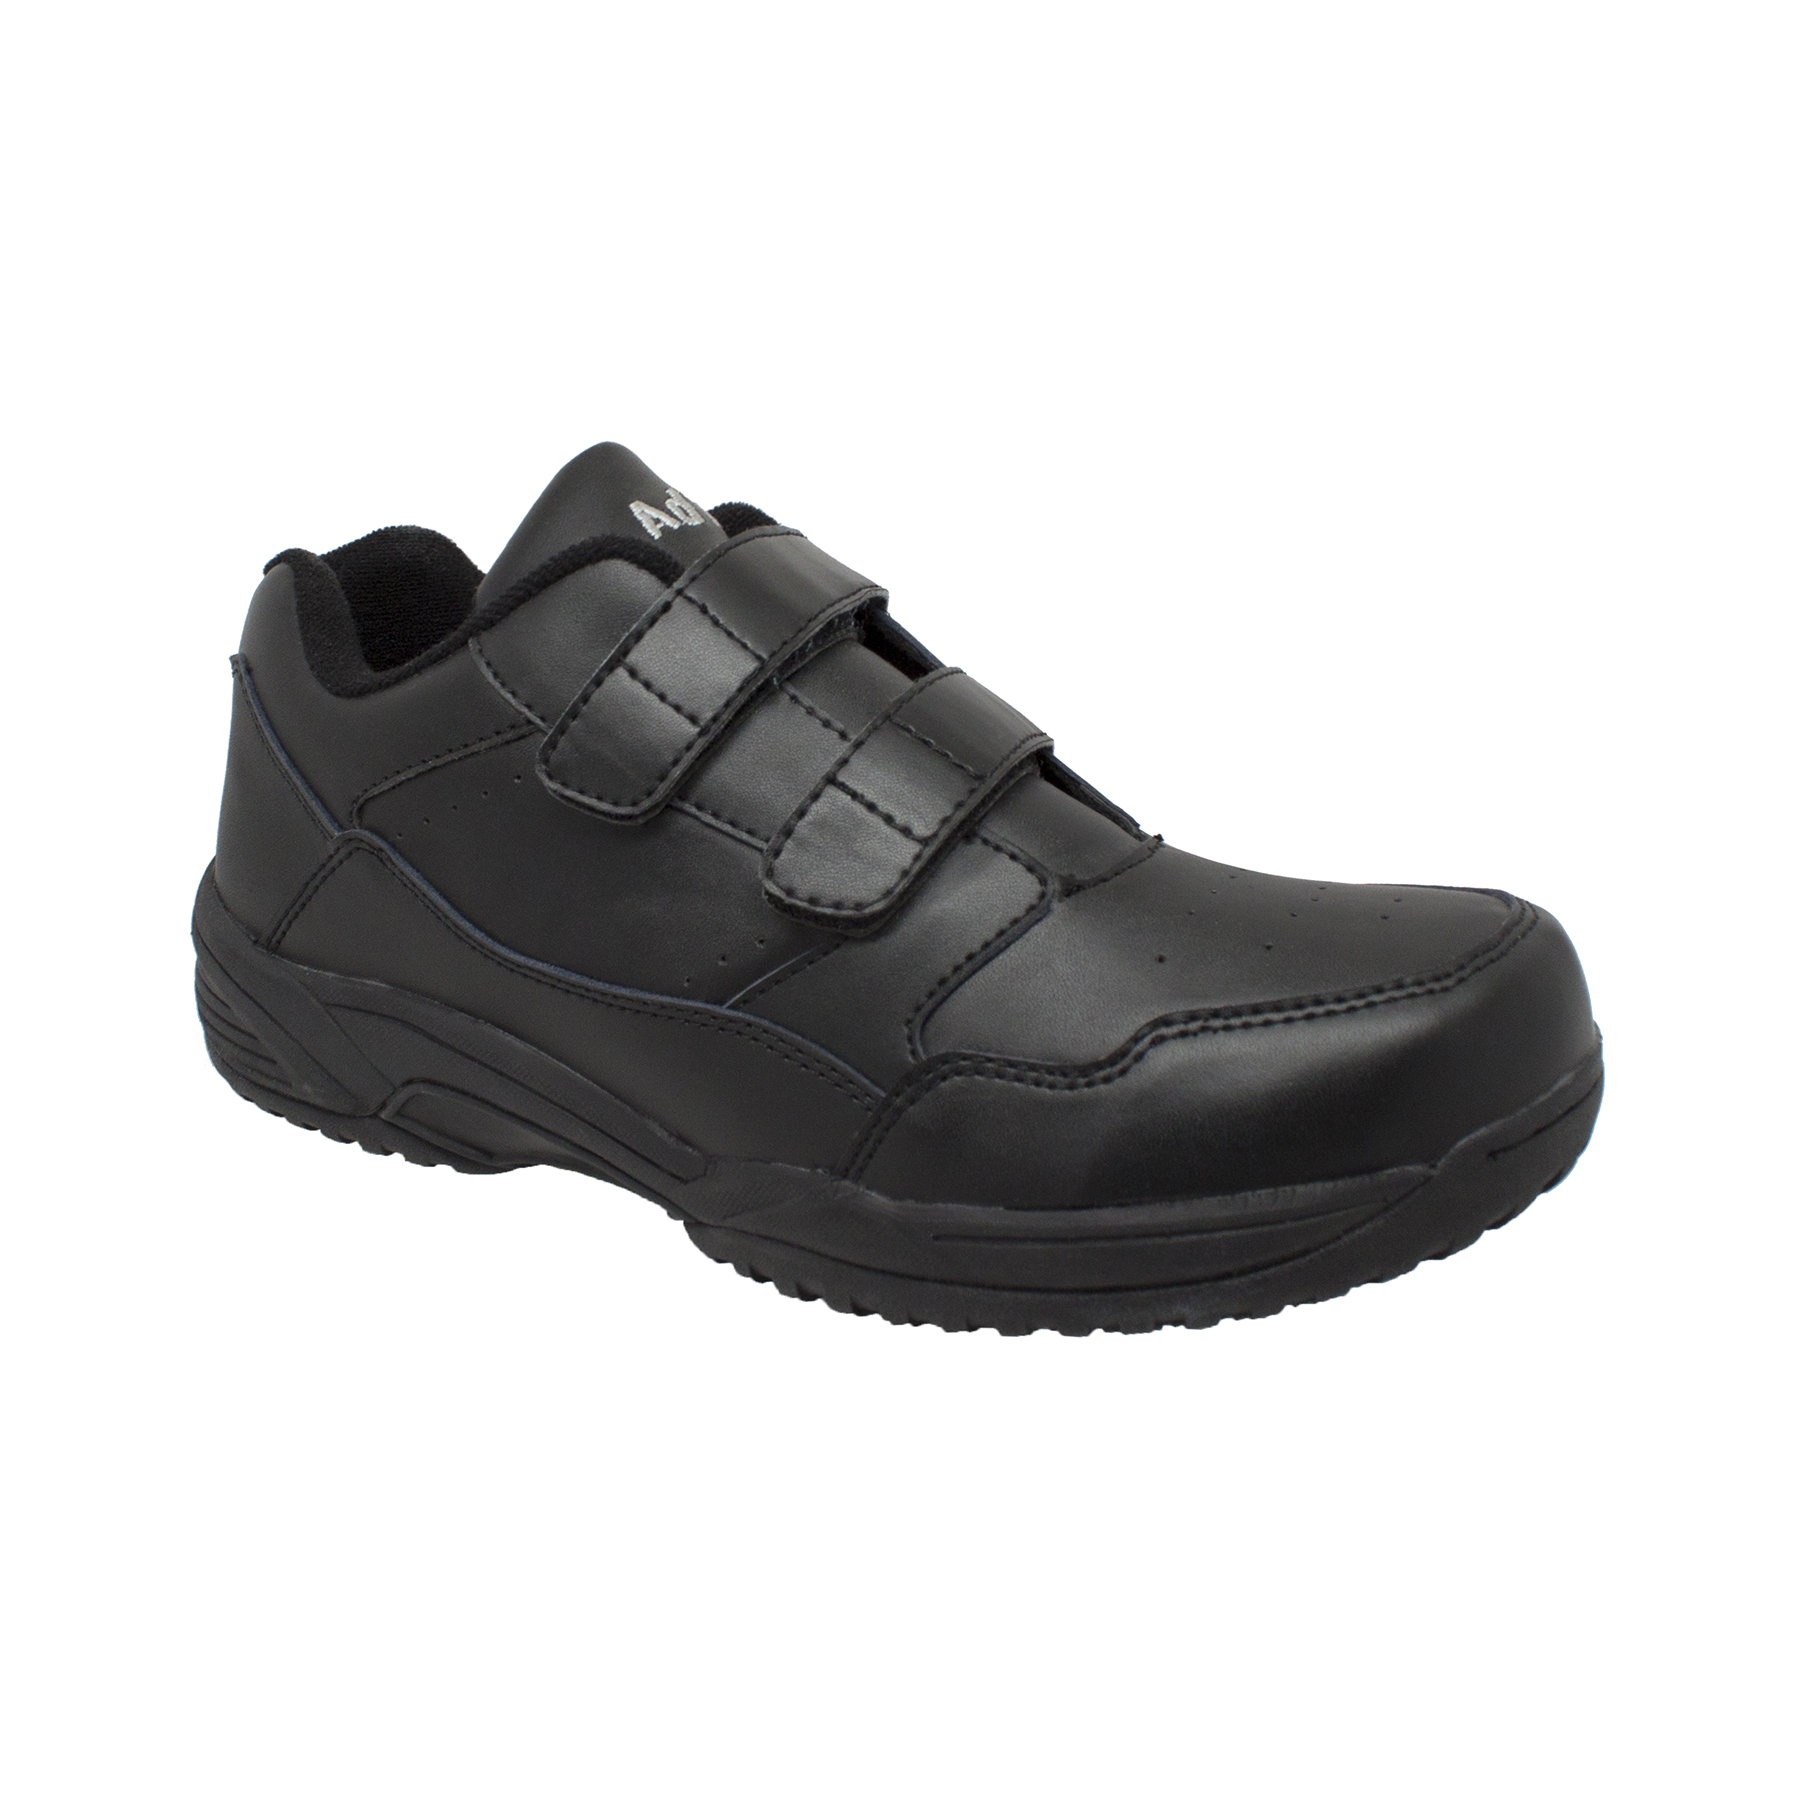 Velcro Shoes - Walmart.com